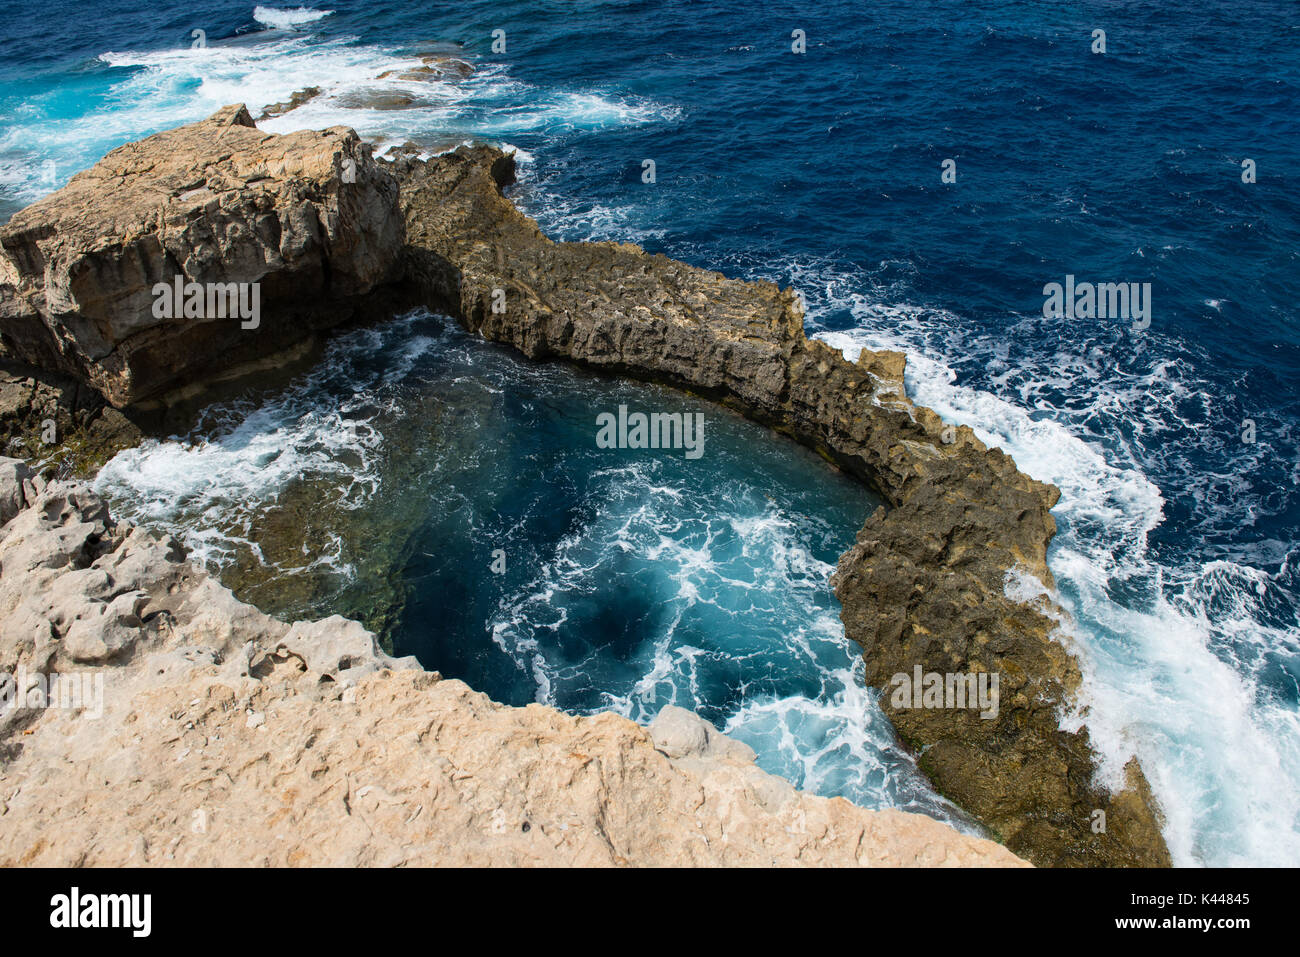 Rocky coastline and sea. Blue hole and the collapsed Azure window in Dwejra Bay, Gozo, Malta - Stock Image